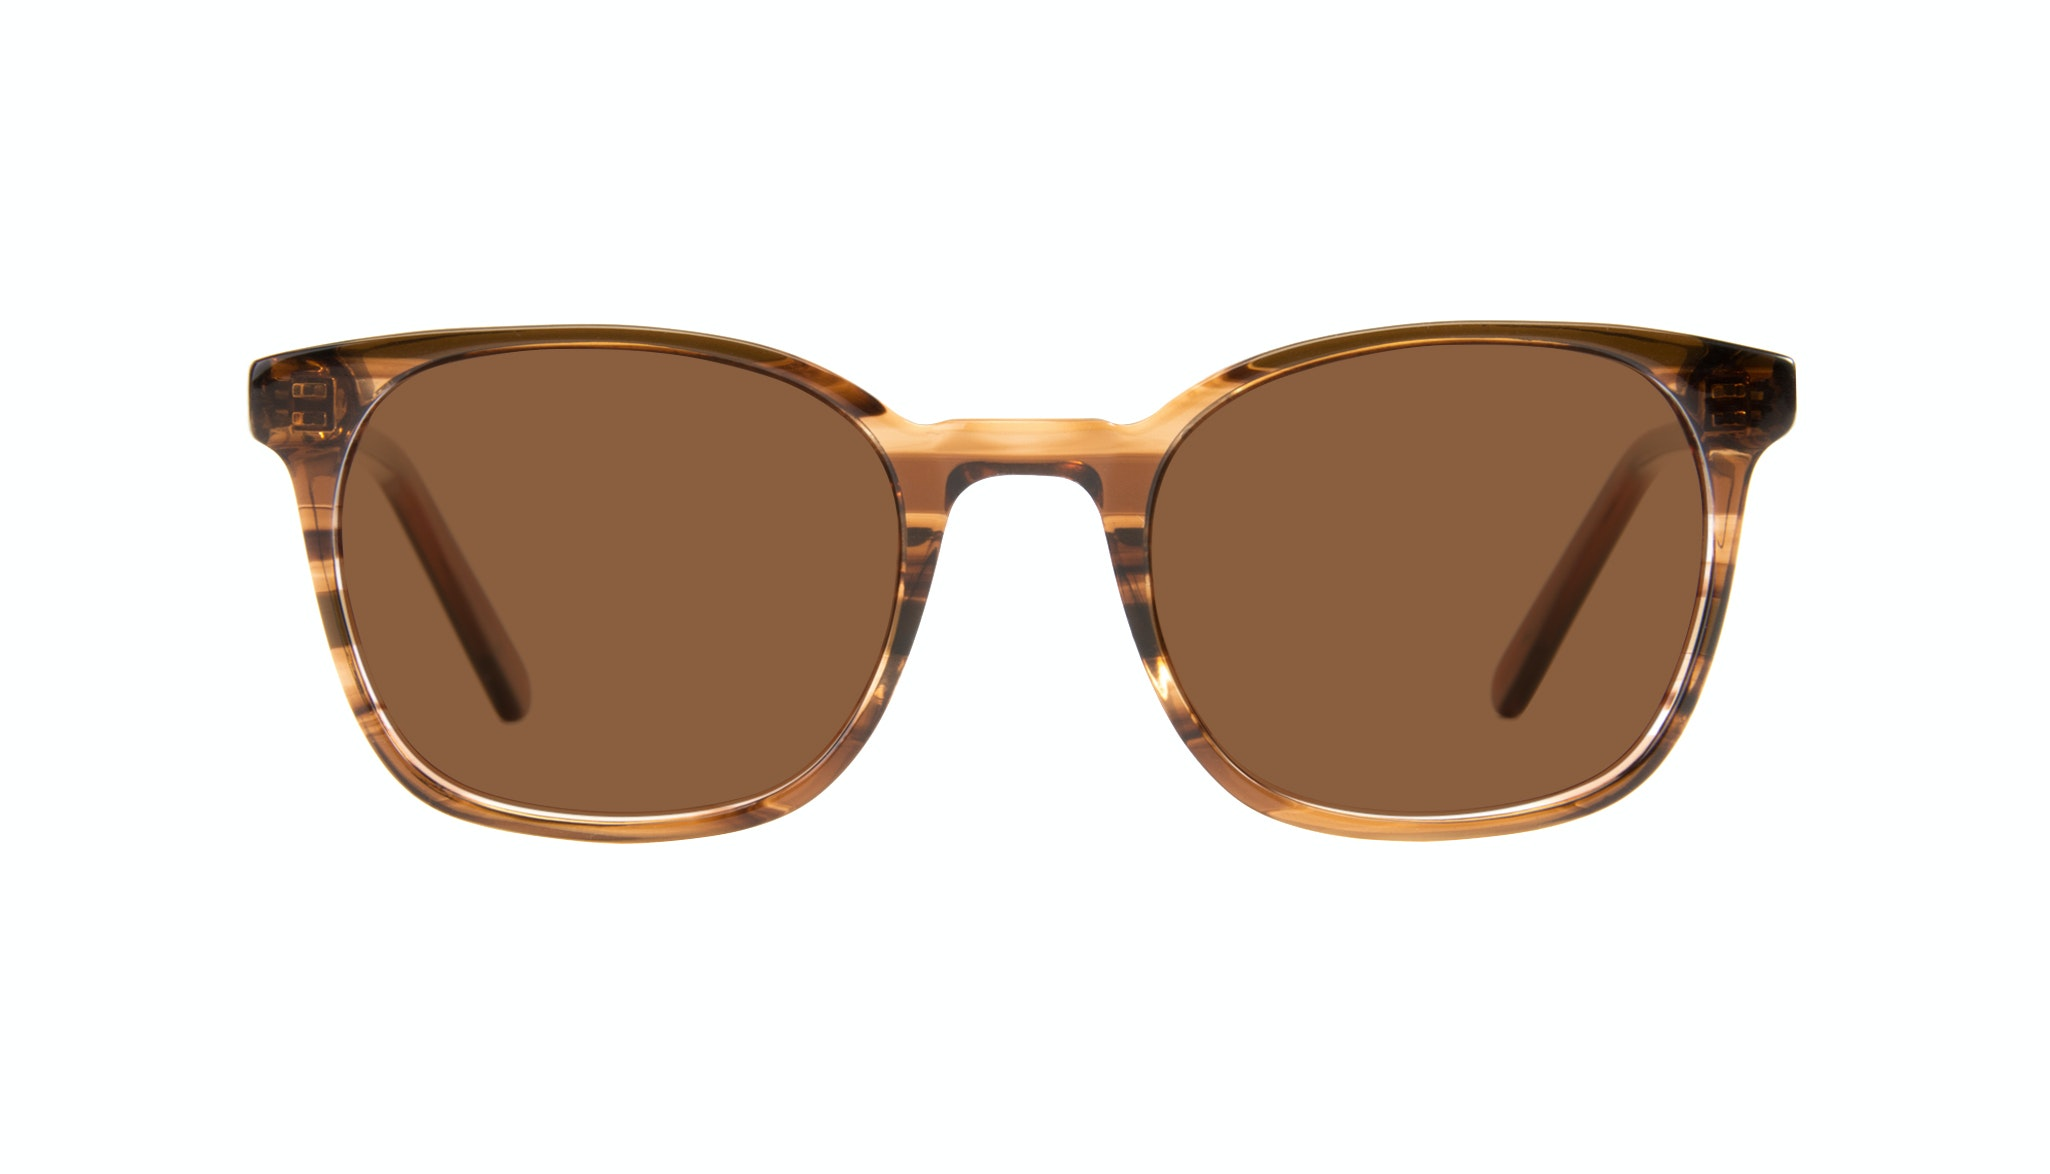 Affordable Fashion Glasses Rectangle Square Sunglasses Men Peak Wood